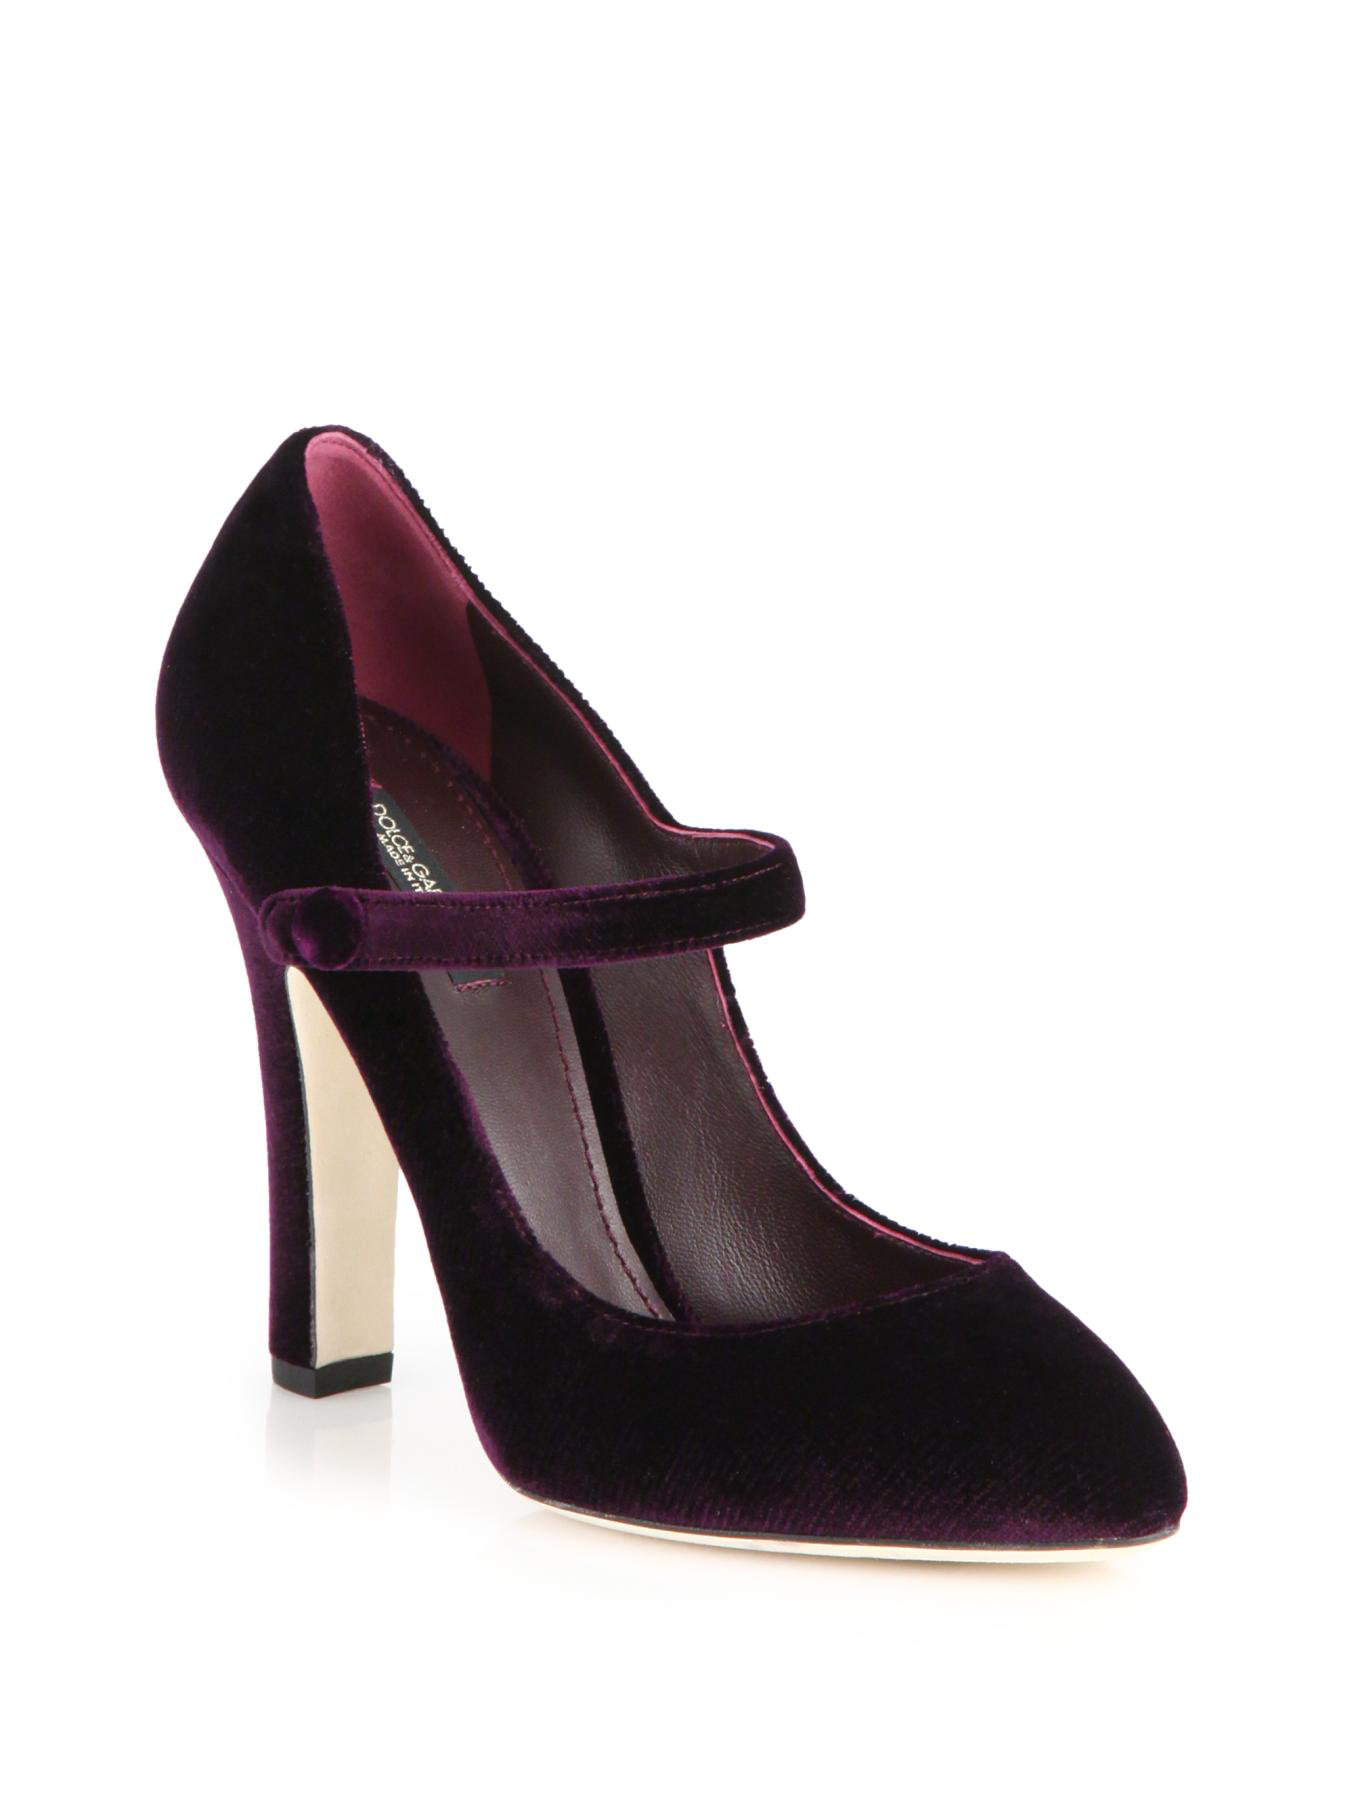 Dolce & gabbana Velvet Mary Jane Pumps in Purple | Lyst